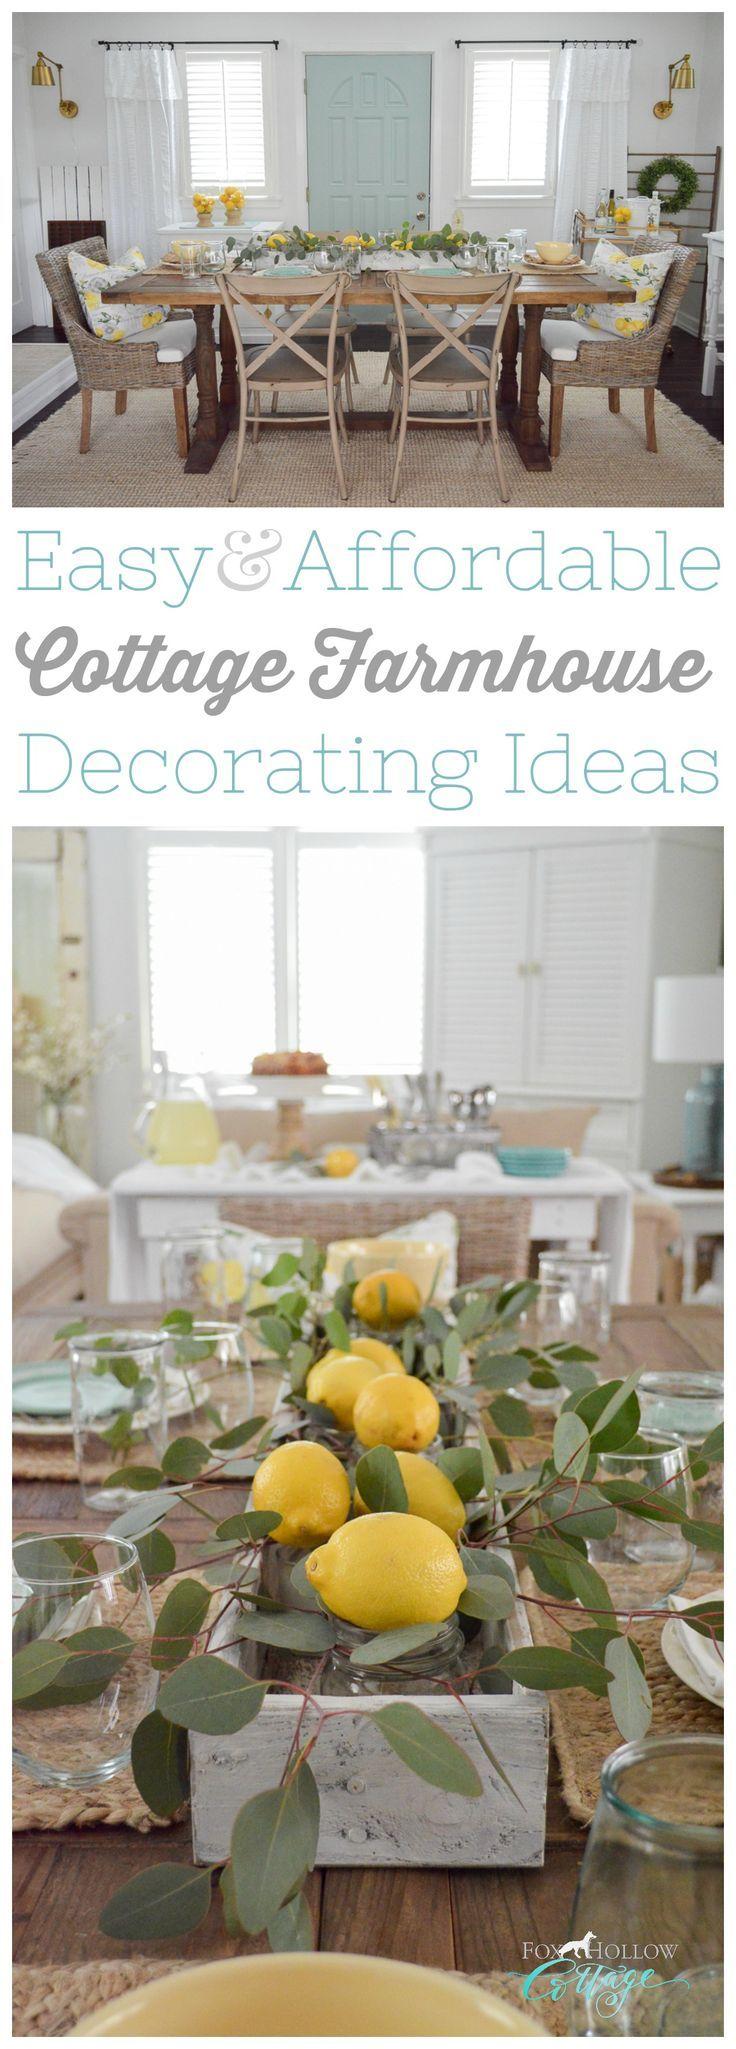 Best 25+ Farmhouse decorative accents ideas on Pinterest ...